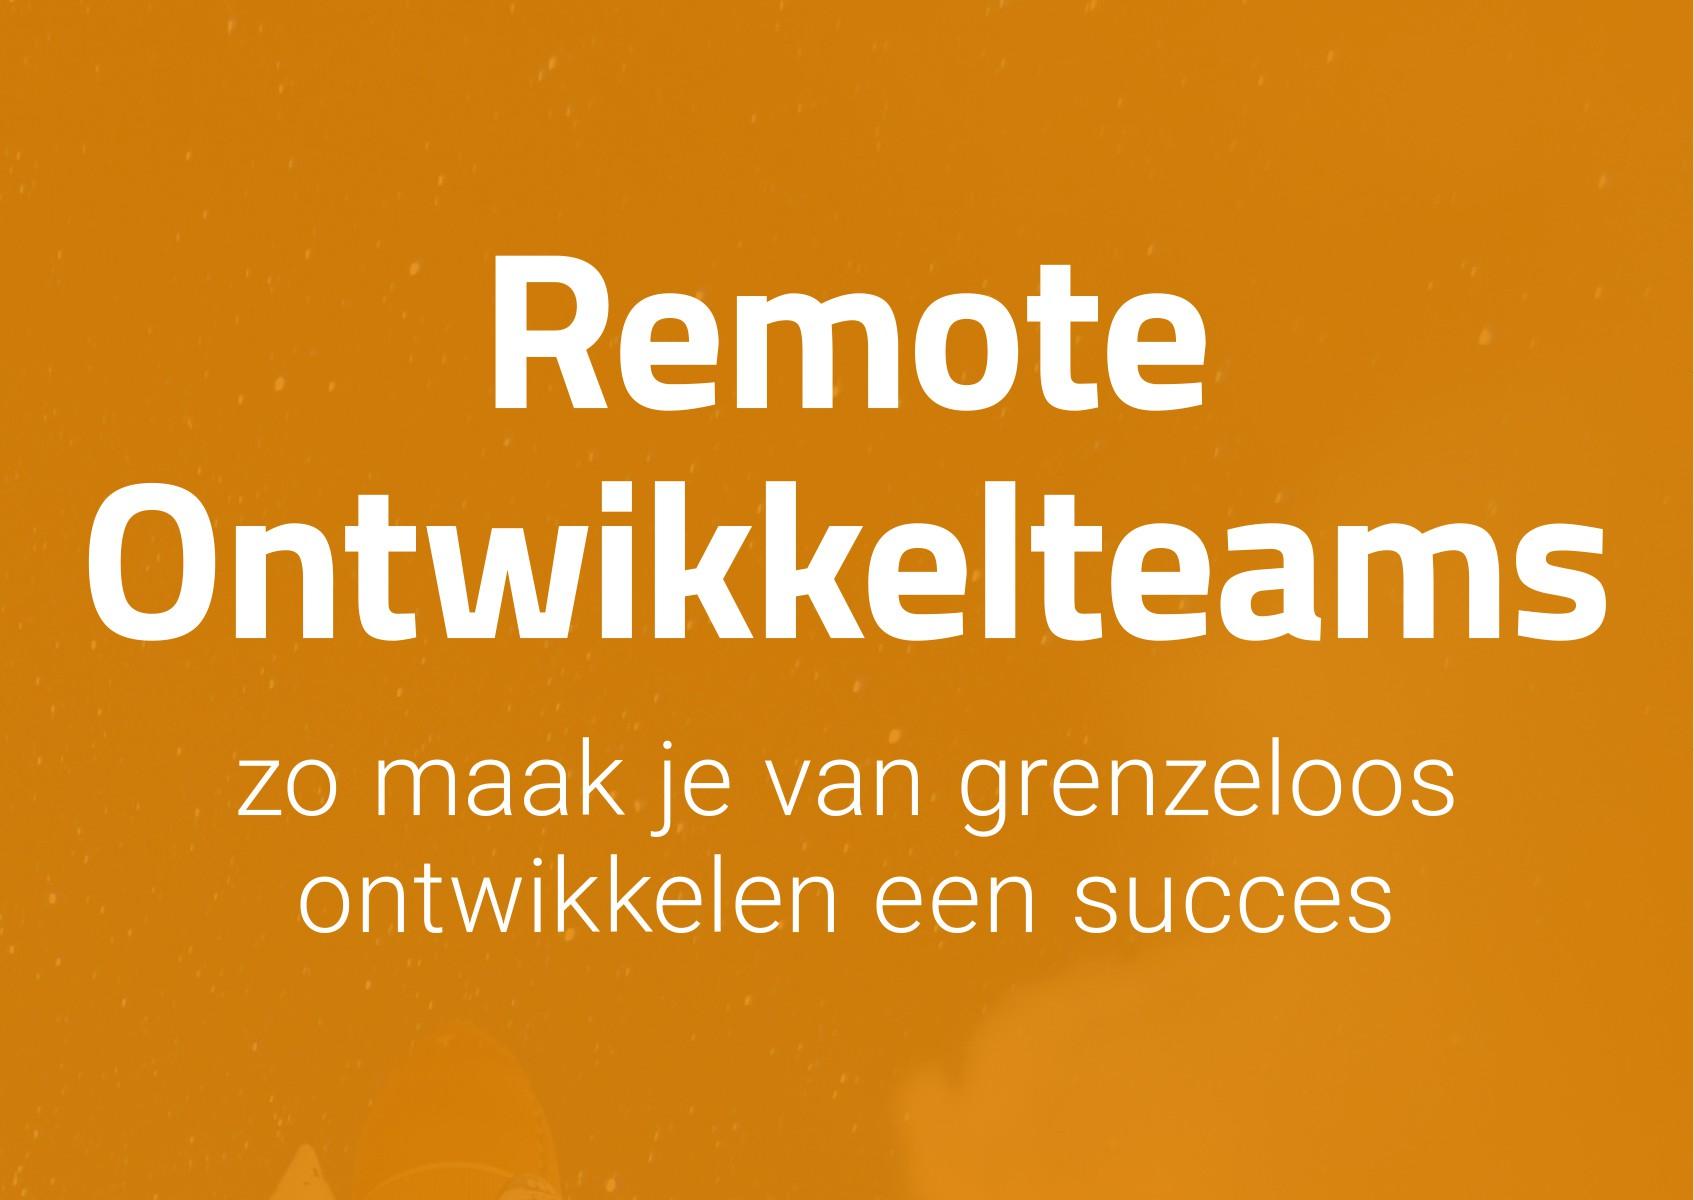 Proshore eBook: Remote Ontwikkelteams